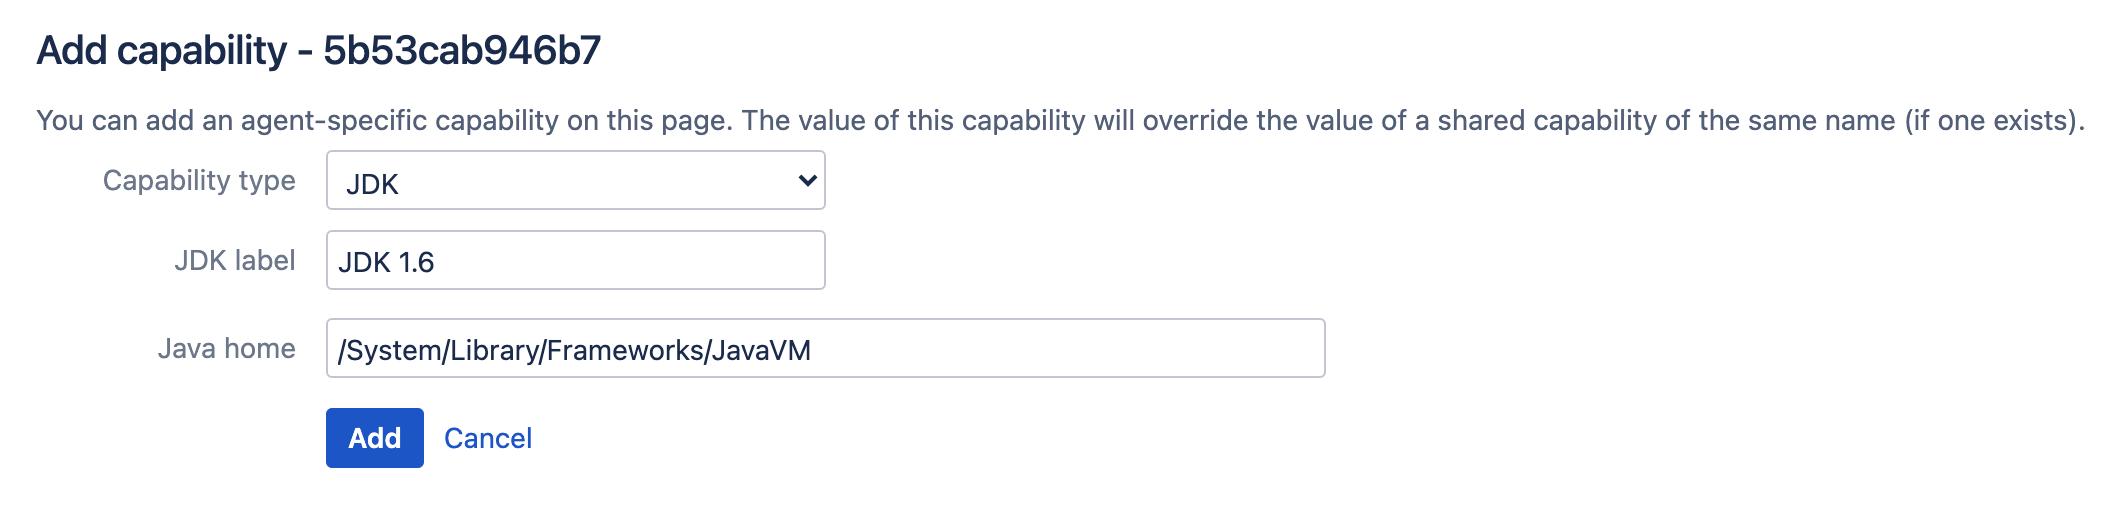 JDK new capability configuration